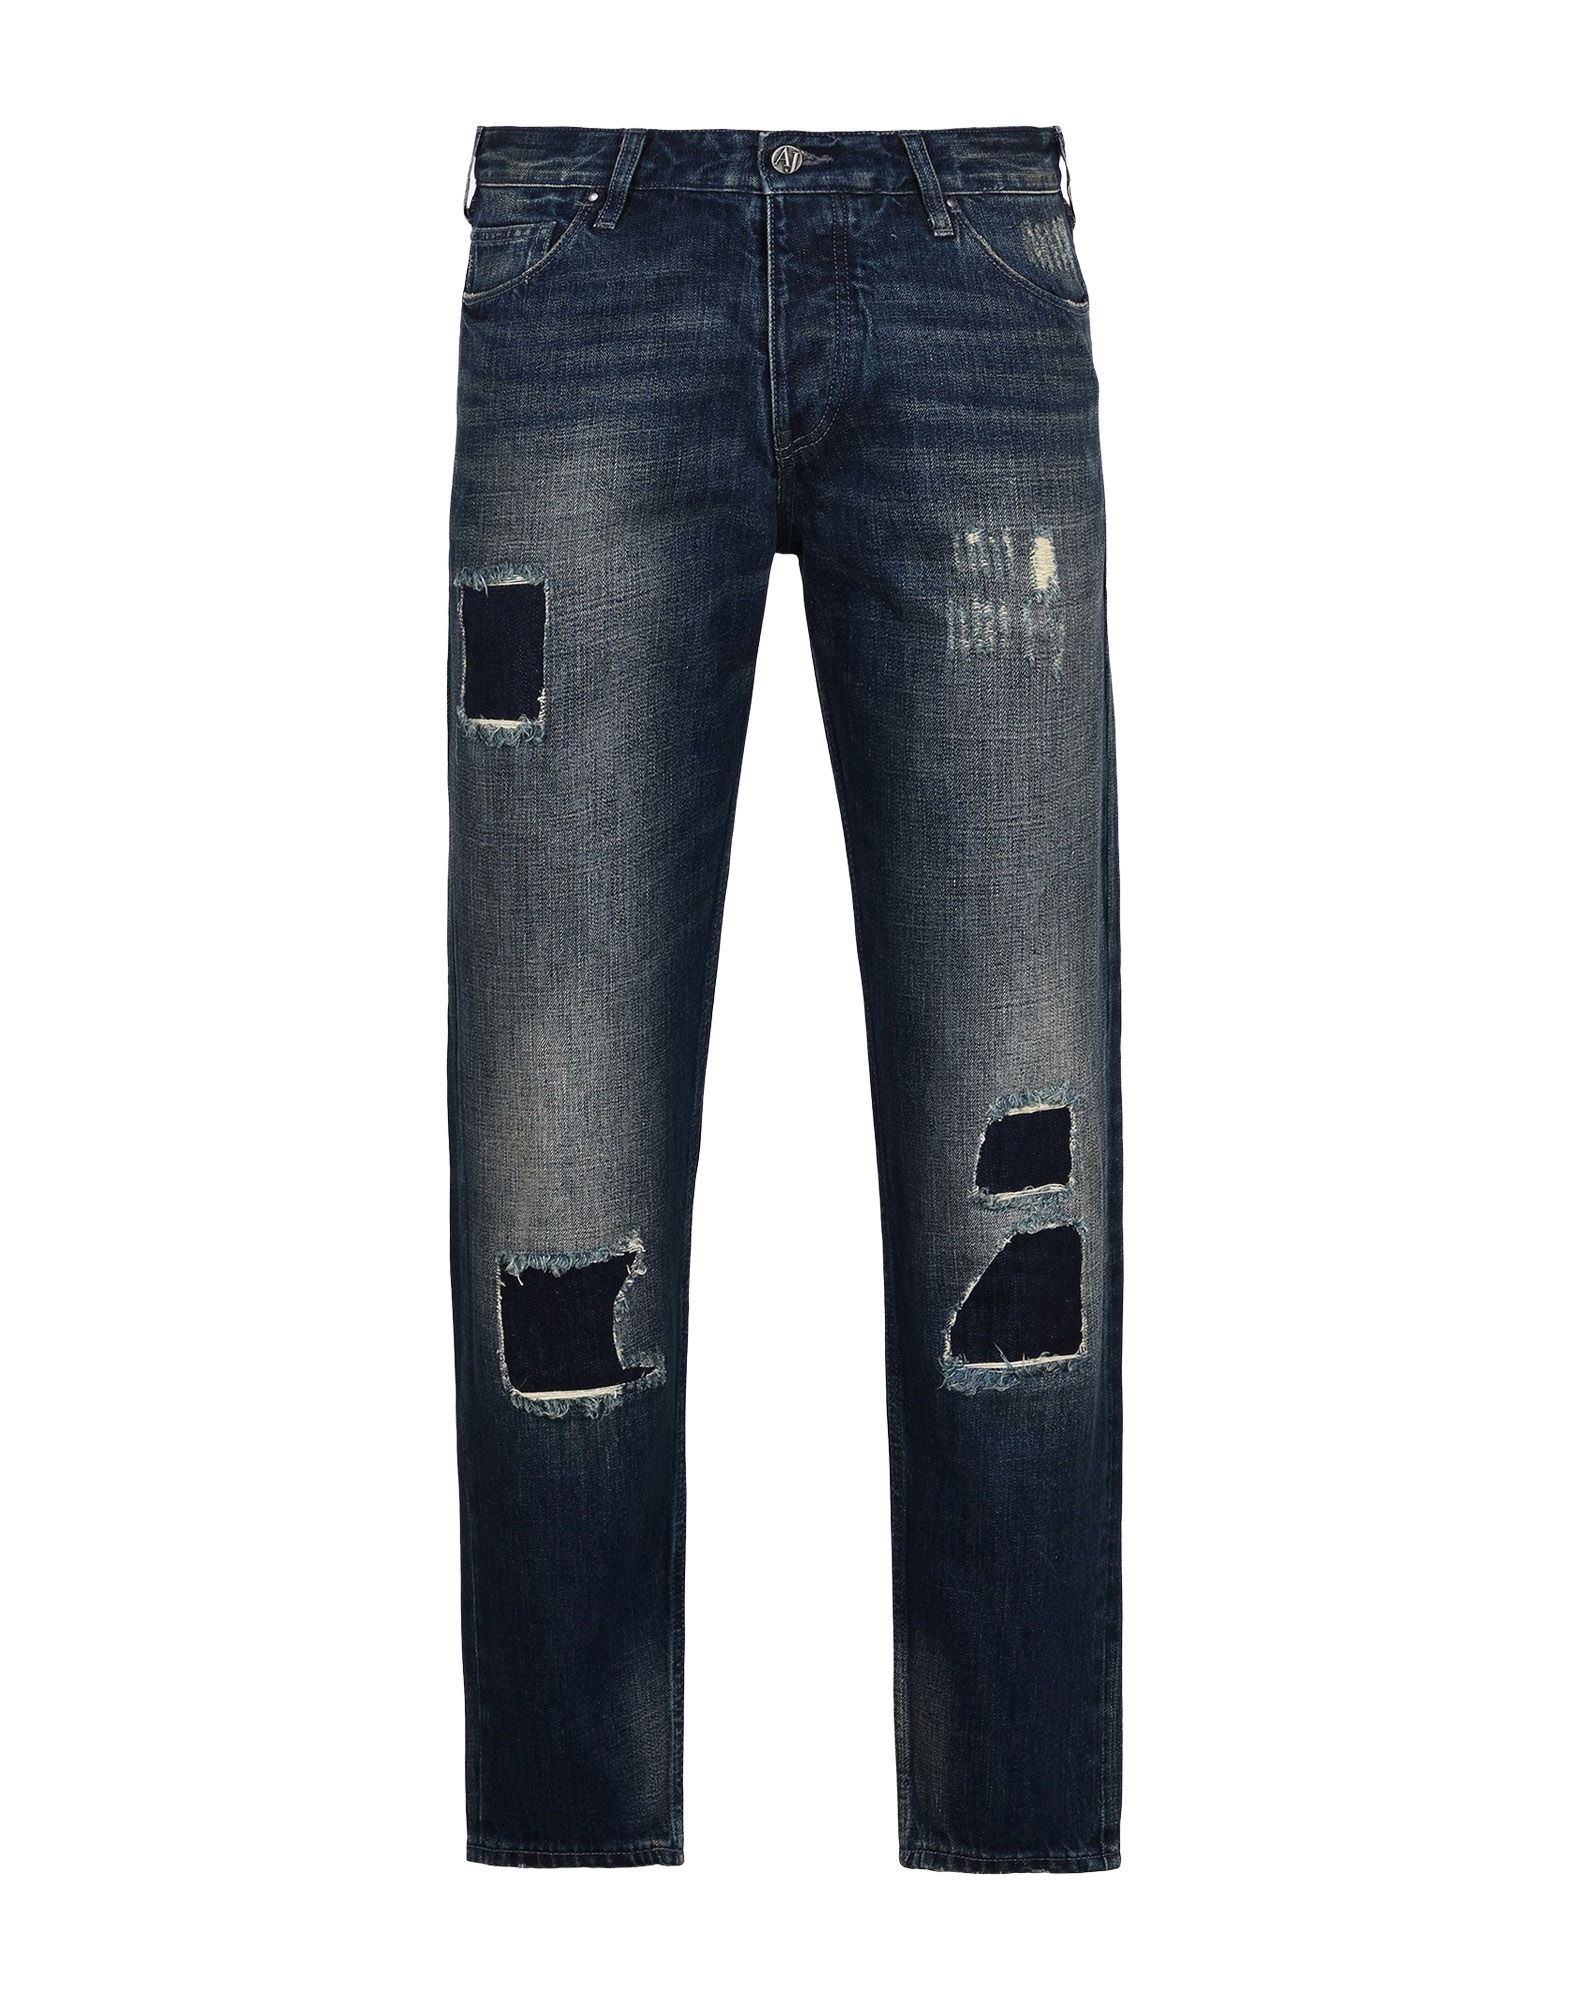 ARMANI JEANS Джинсовые брюки summer boyfriend jeans for women hole ripped white lace flowers denim pants low waist mujer vintage skinny stretch jeans female